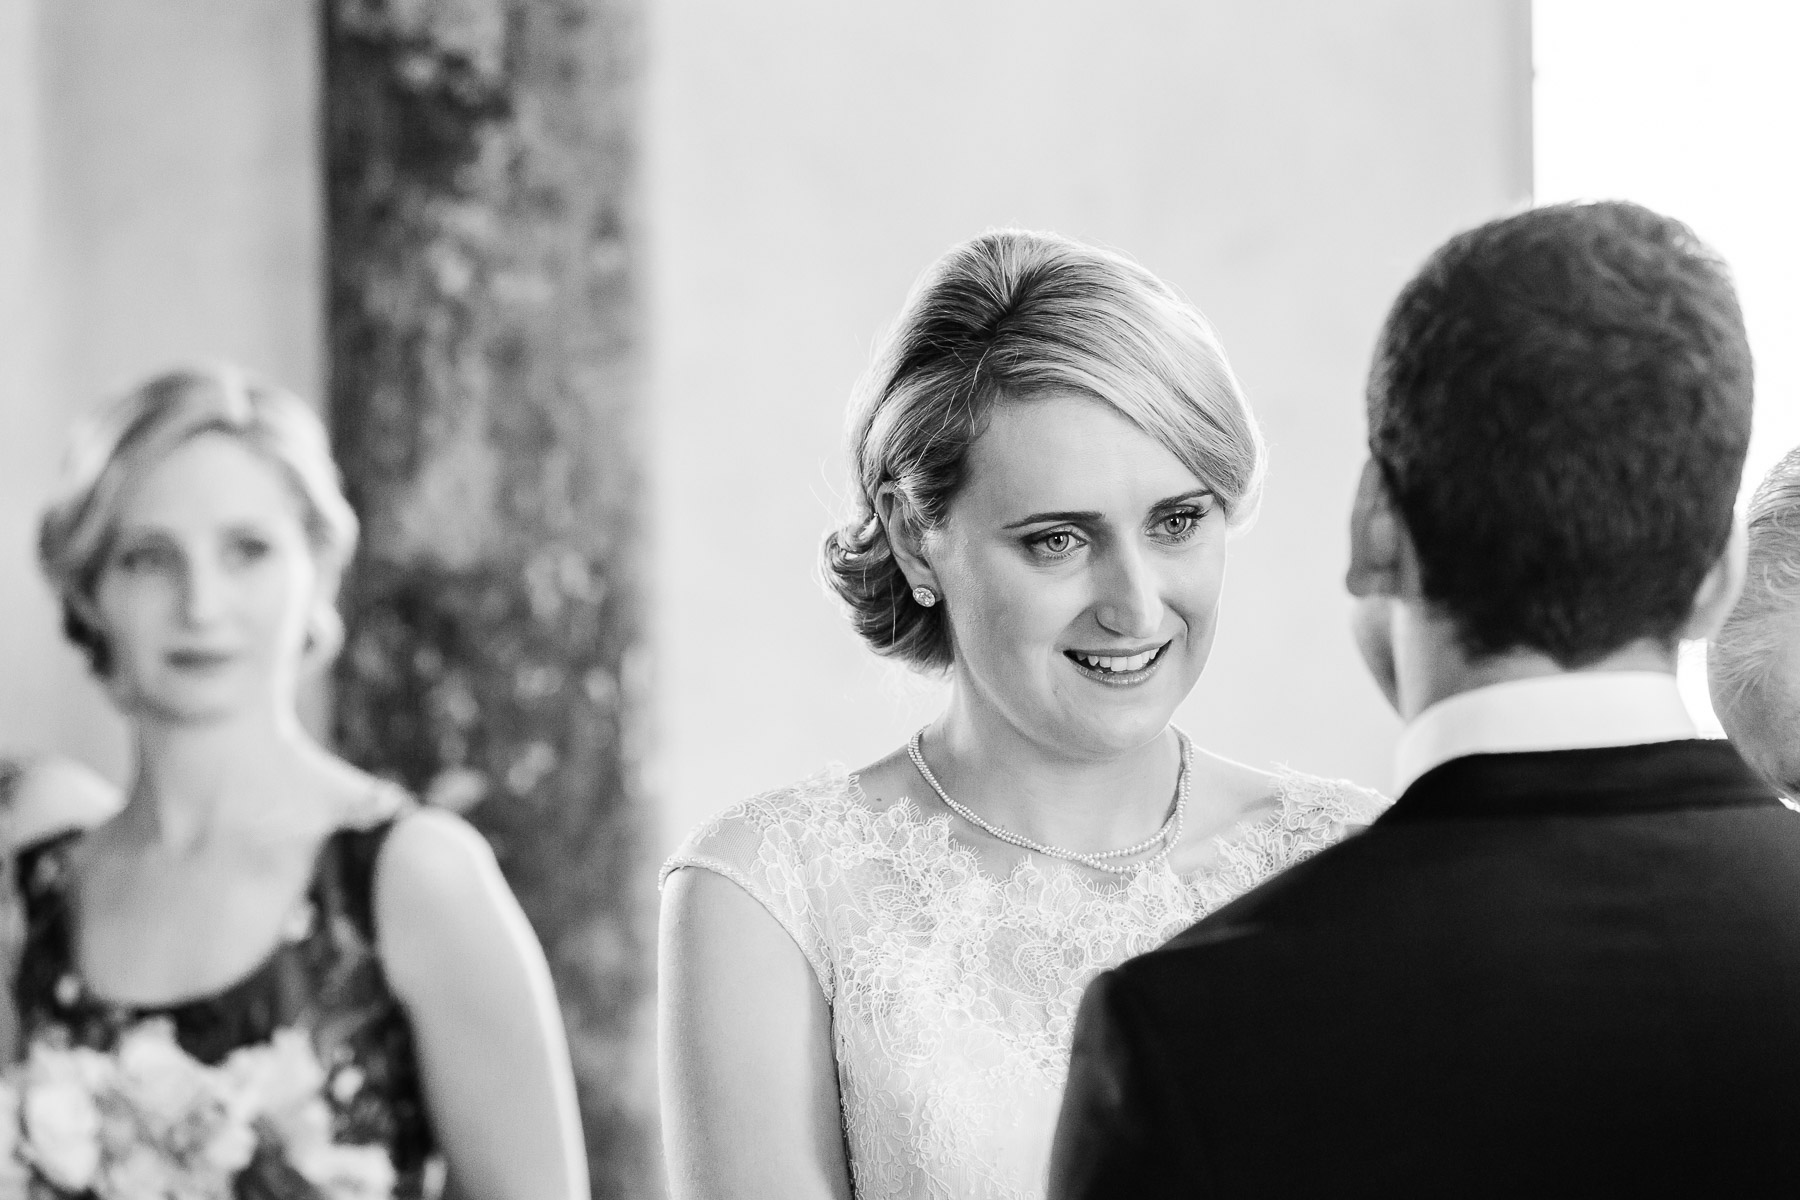 Marnie_and_Charlie_Yarra_Valley_Wedding_Blog-47.jpg